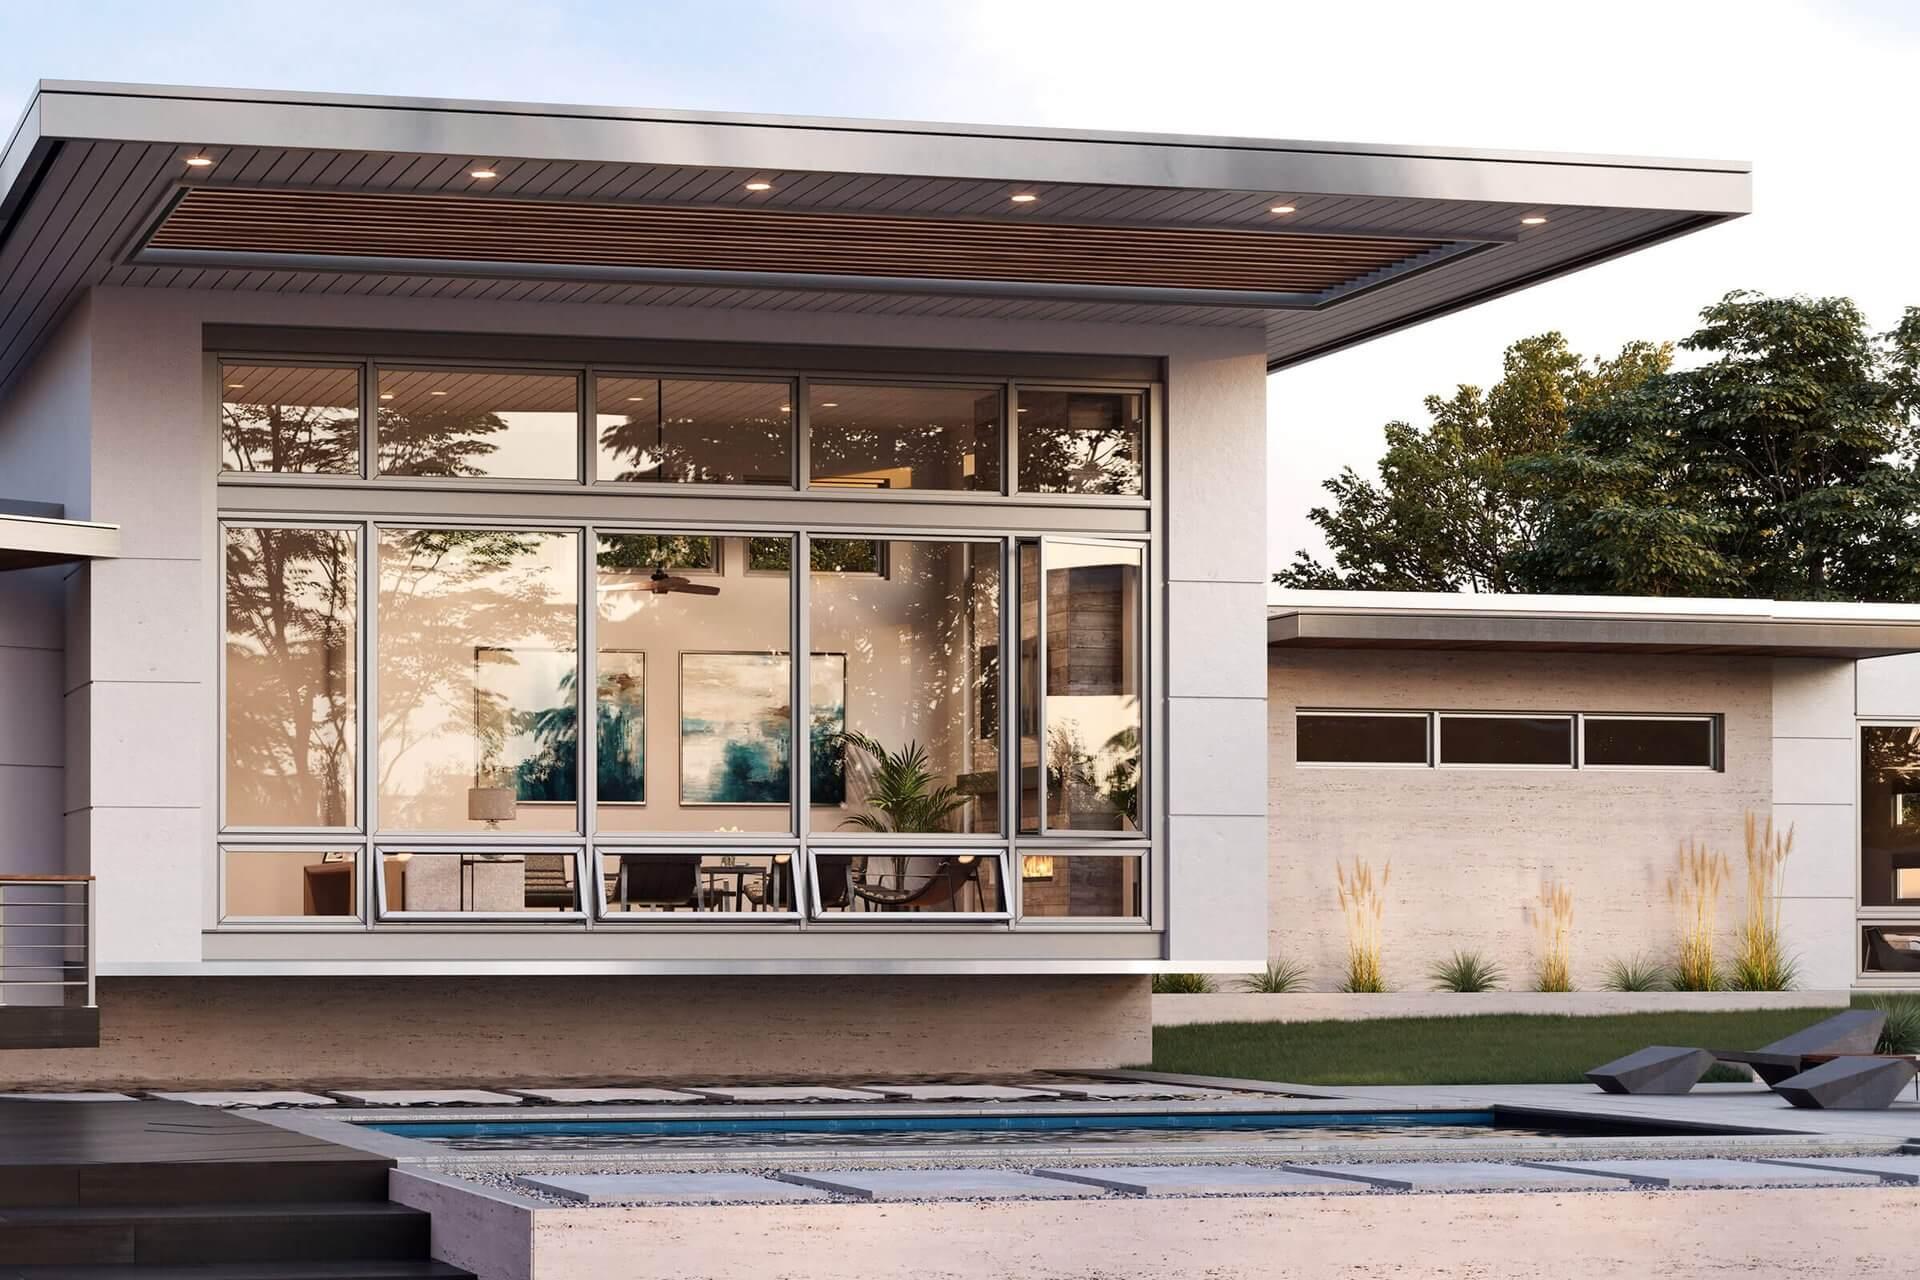 signature-modern-casement-awning-1-rmd